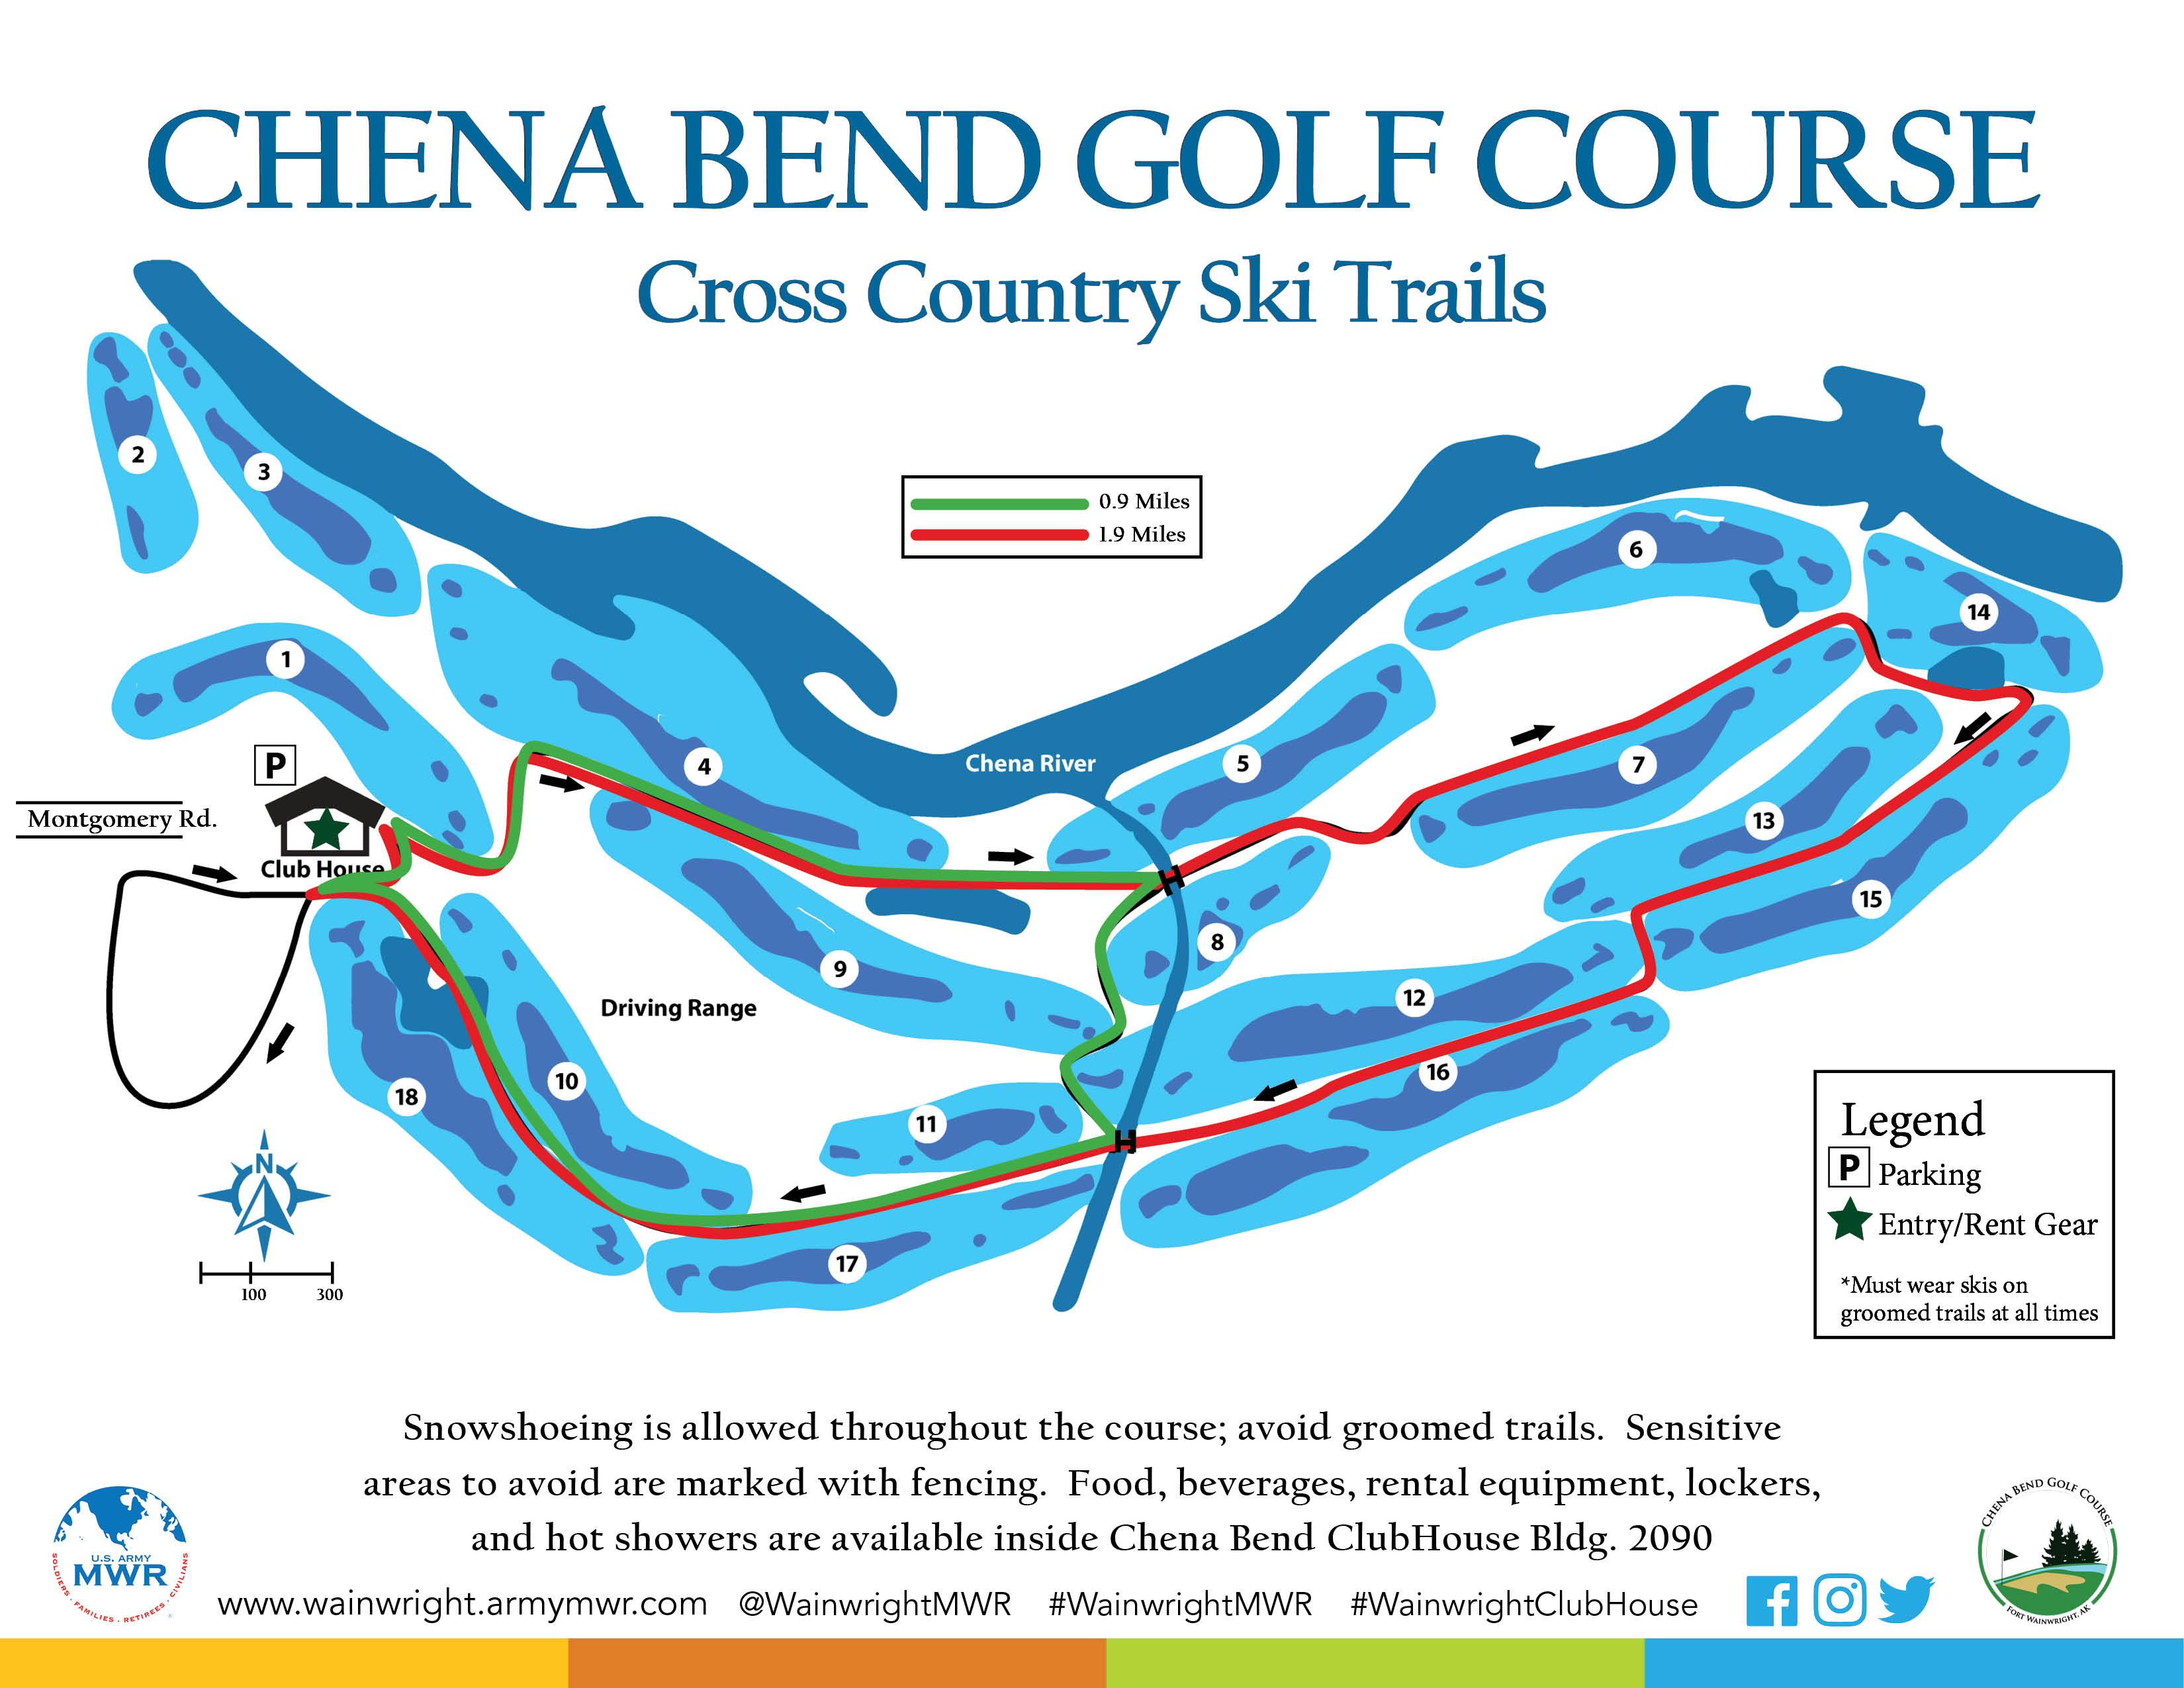 Chena Bend Cross Country Ski Map2.jpg